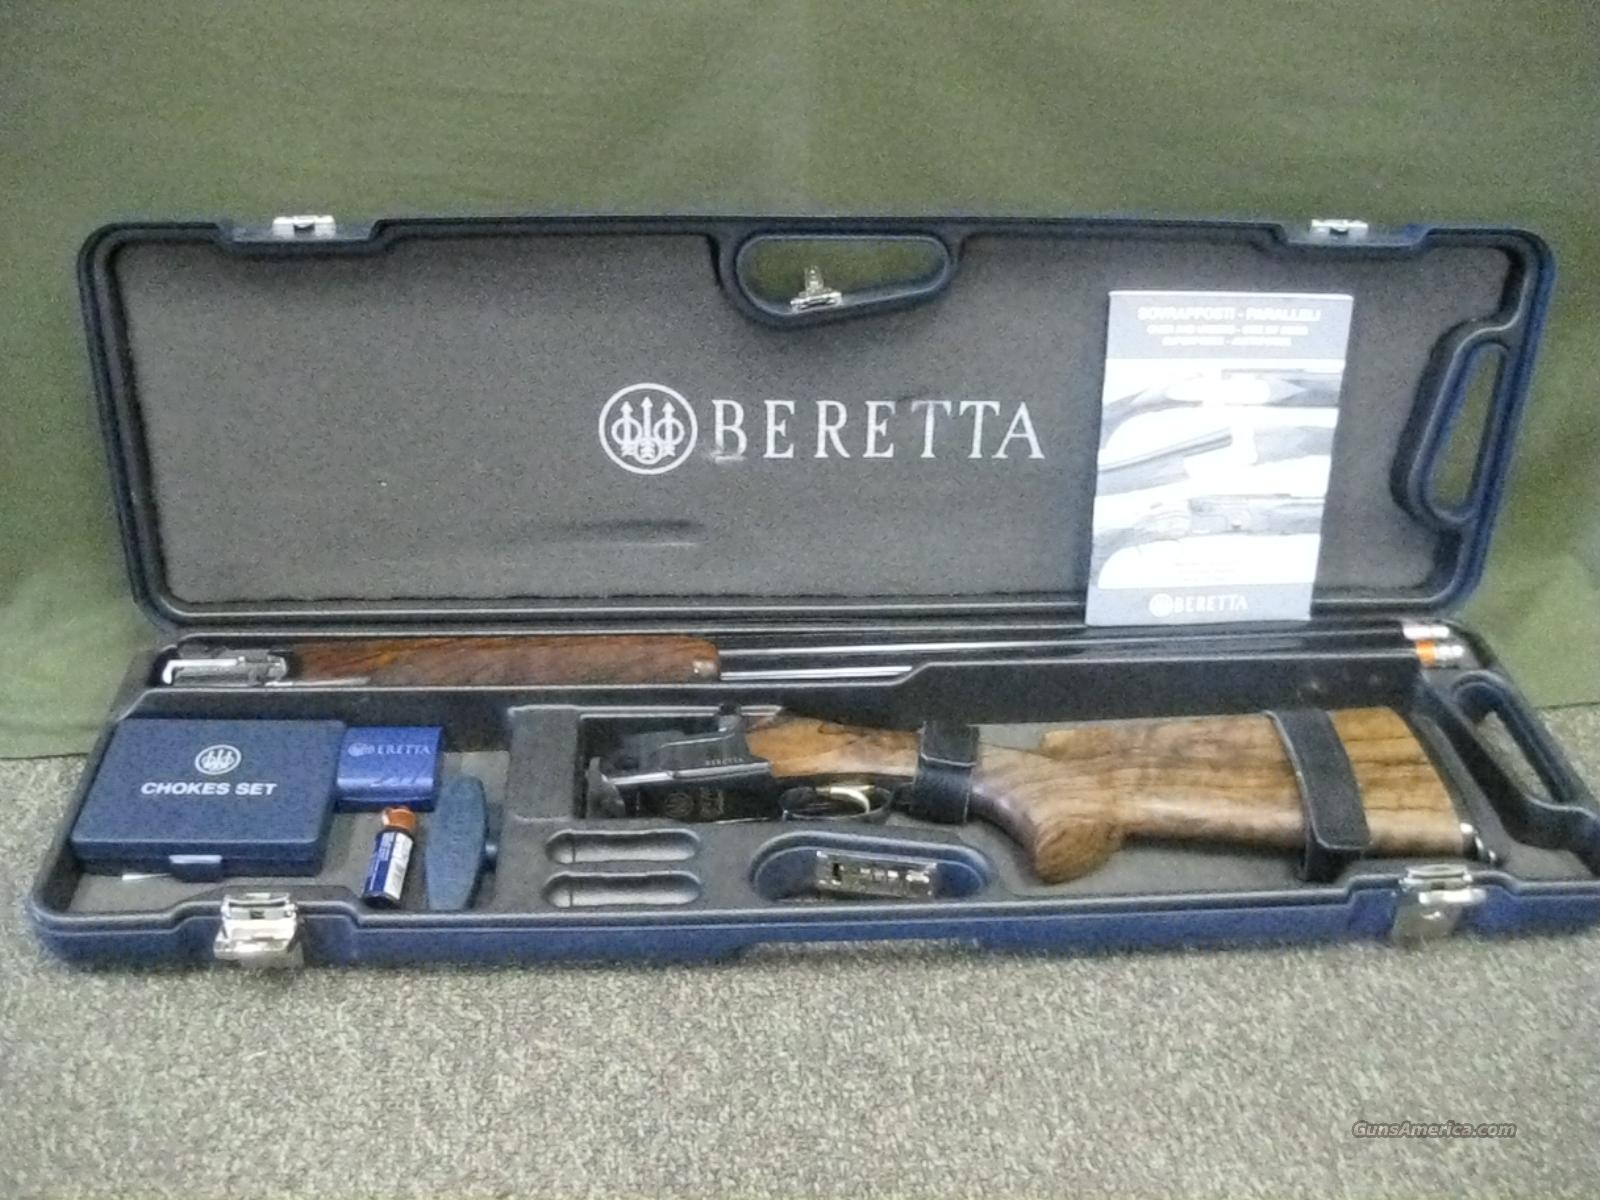 "Beretta DT-10 Sporting 30"" 12ga As New  Guns > Shotguns > Beretta Shotguns > O/U > Trap/Skeet"